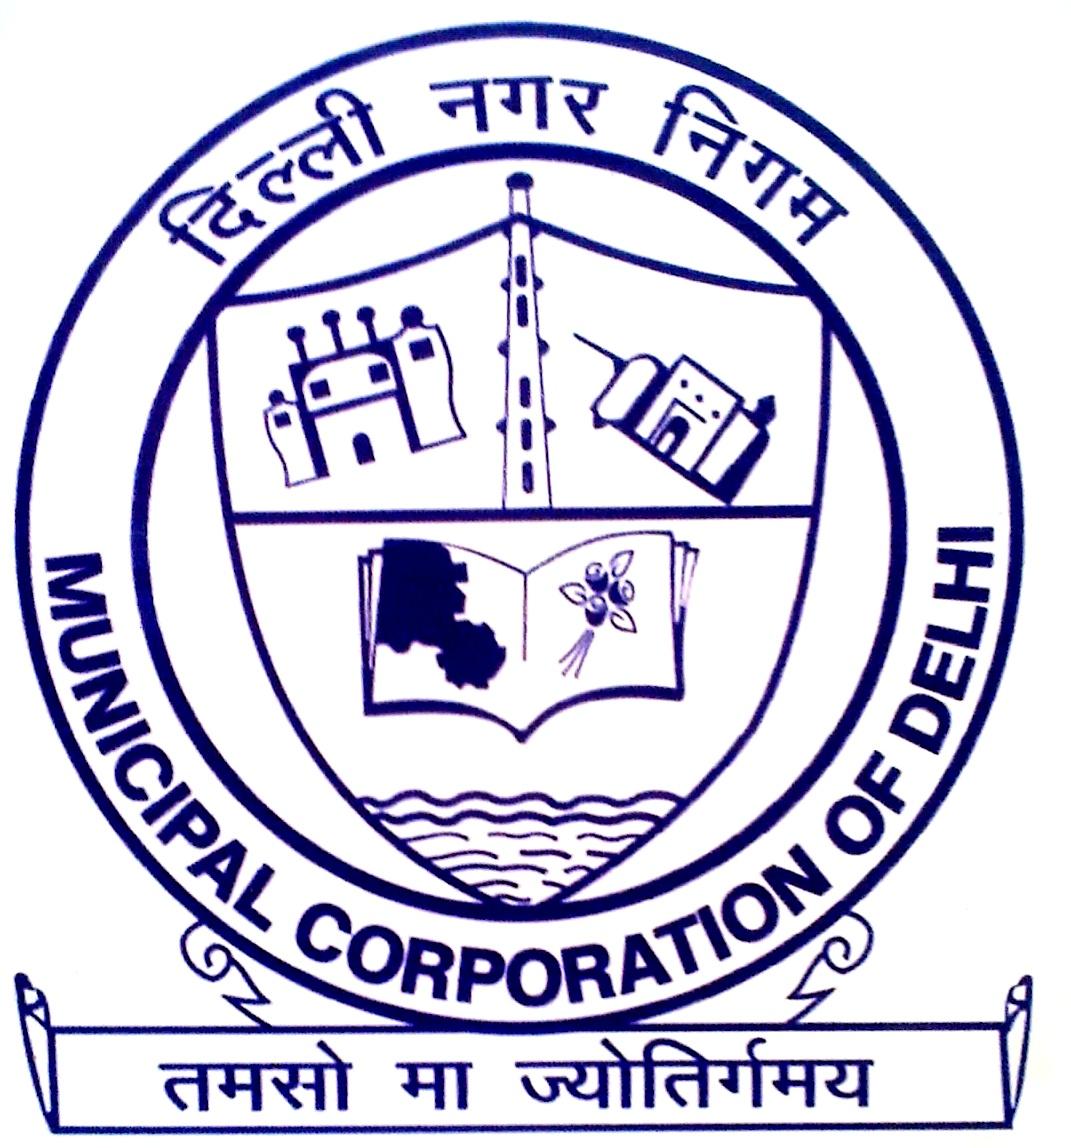 Sarkaari Jobs: Municipal Corporation Of Delhi Recruitment 2013